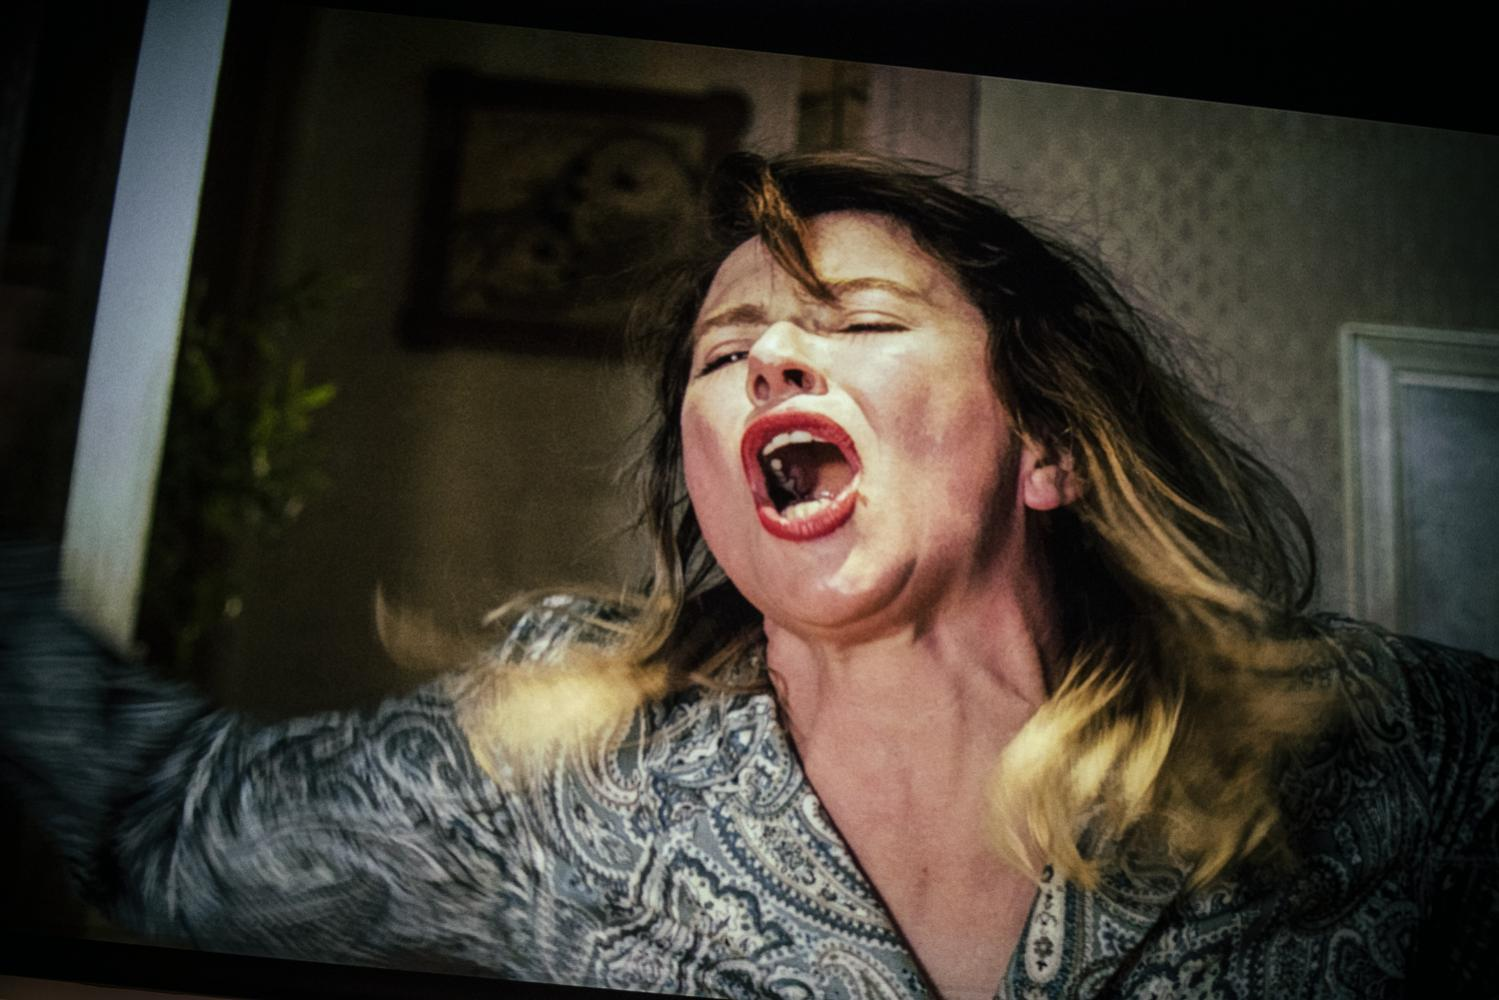 """Pod presją"" (reż. Maja Klaczewska). Teatr Śląski. Fot. Magda Hueckel"